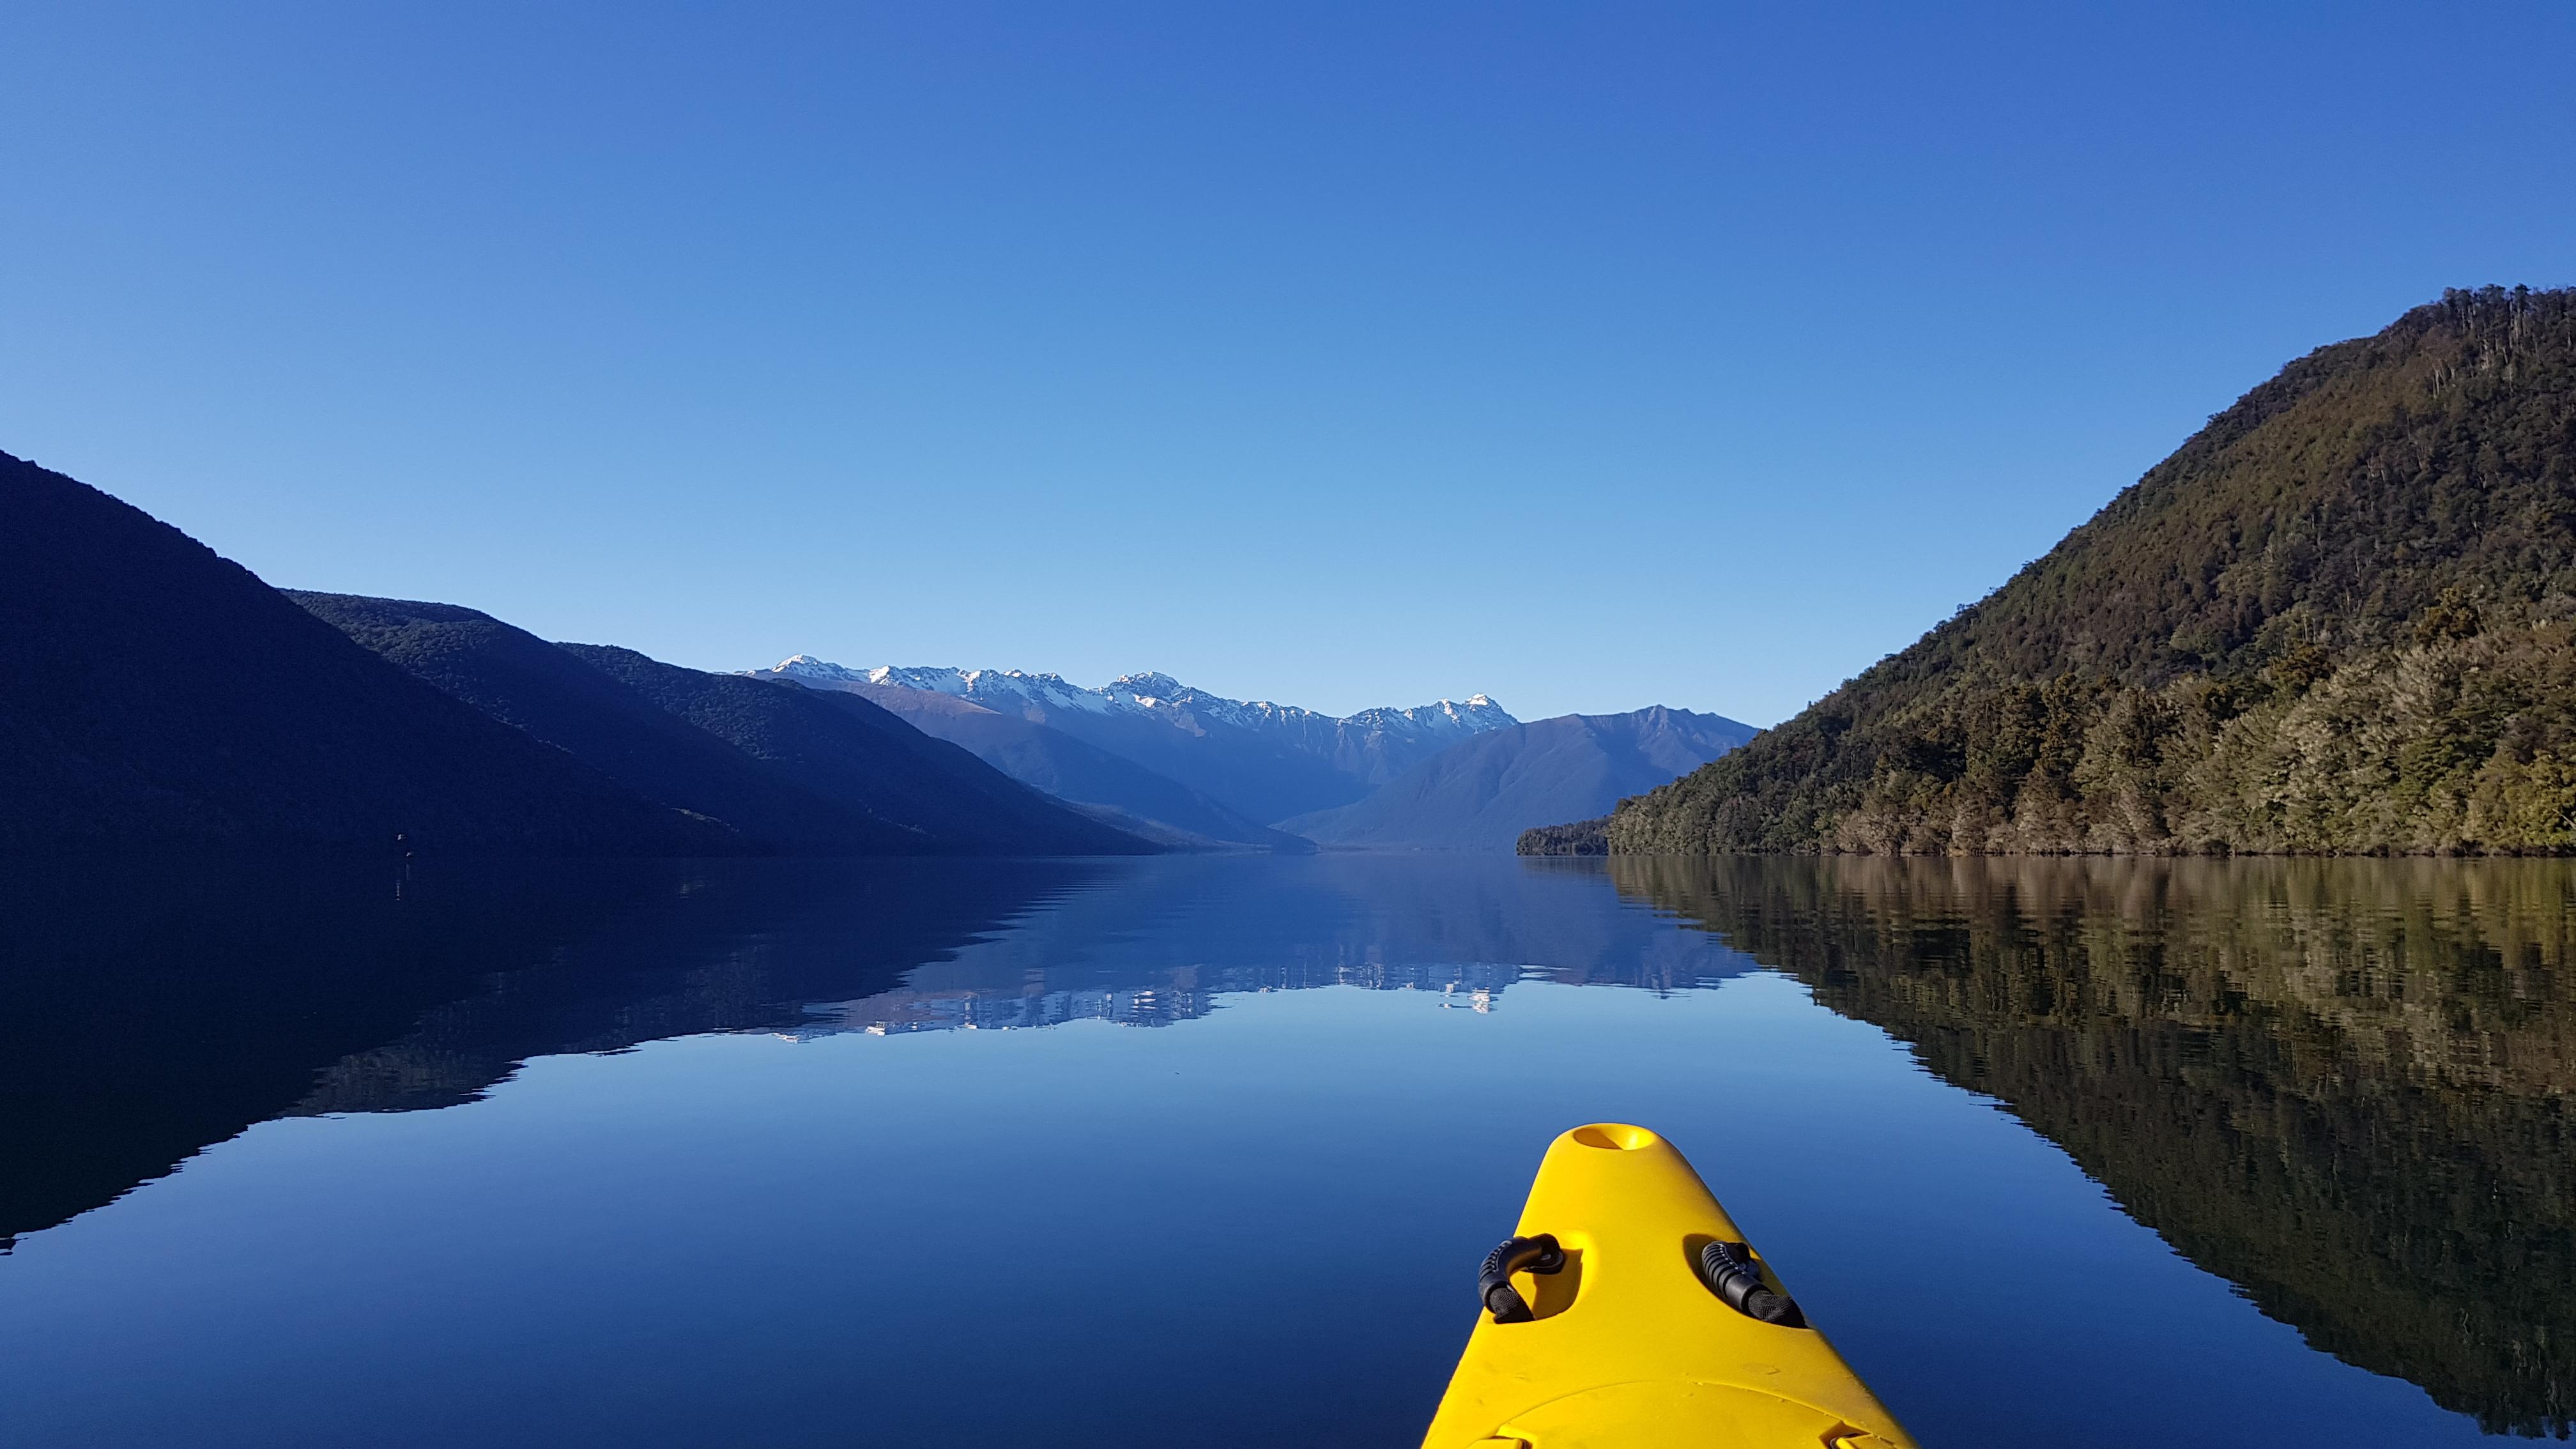 Paddling Lake Rotoroa to D'Urville hut